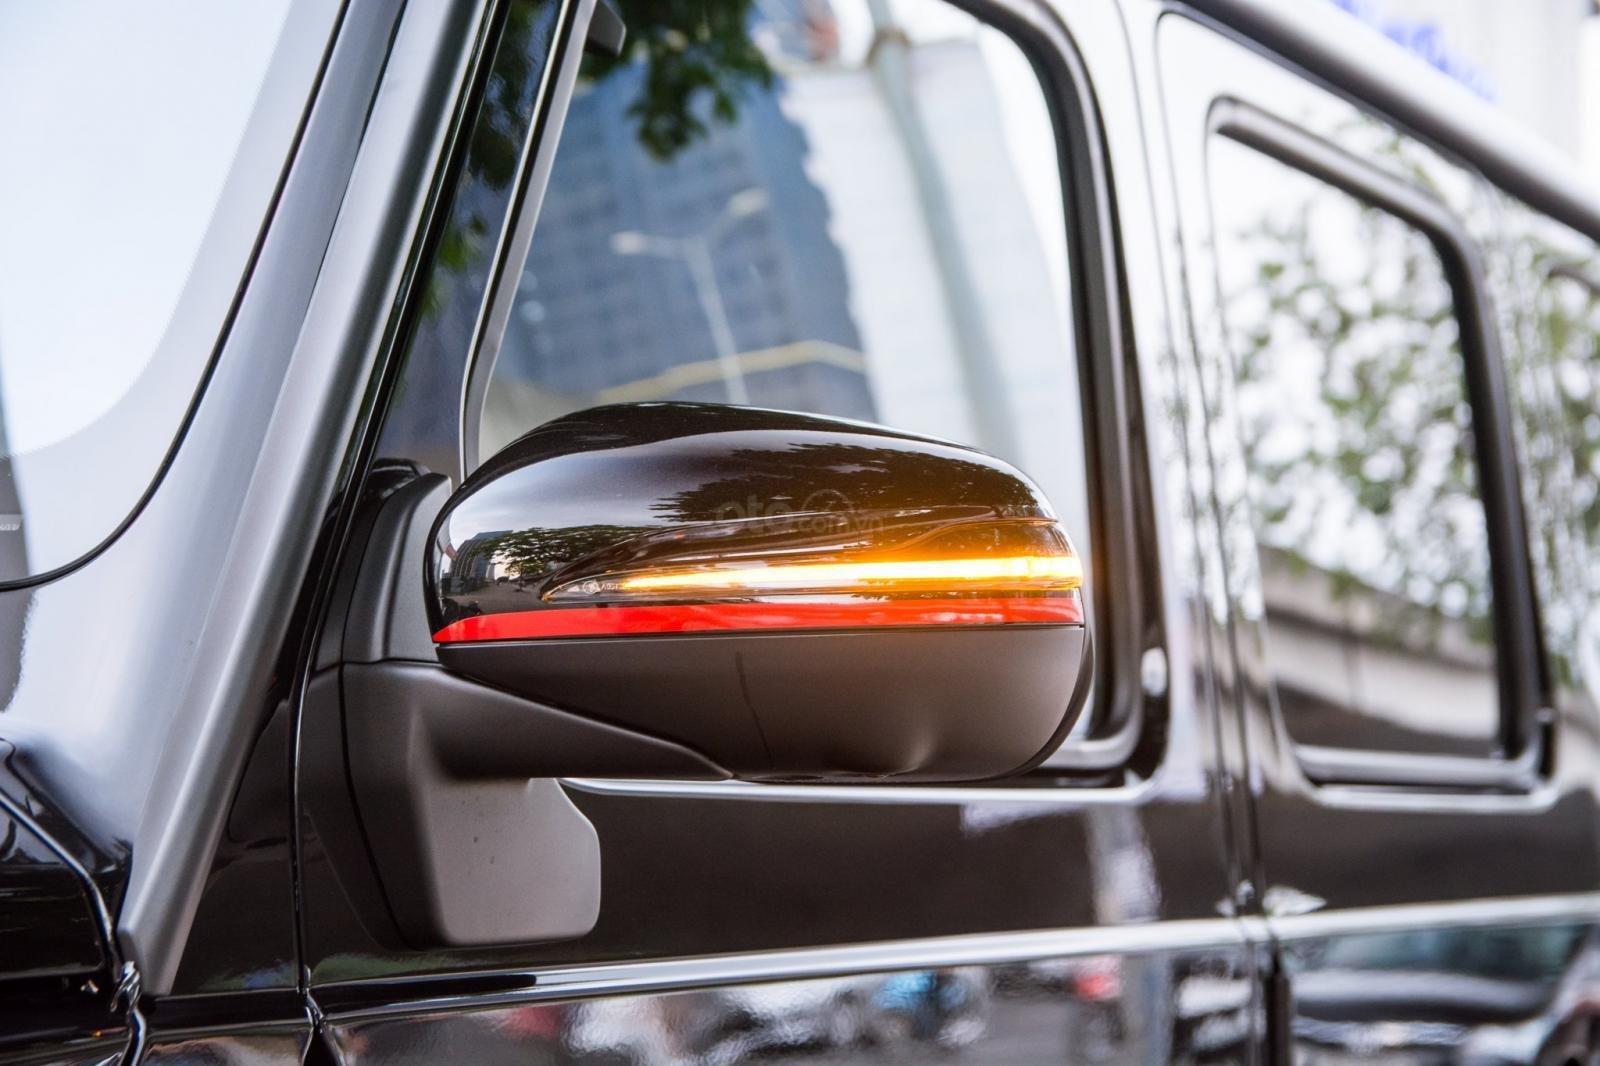 Bán Mercedes-Benz G63 AMG Edition One sản xuất 2019 mới 100% (6)